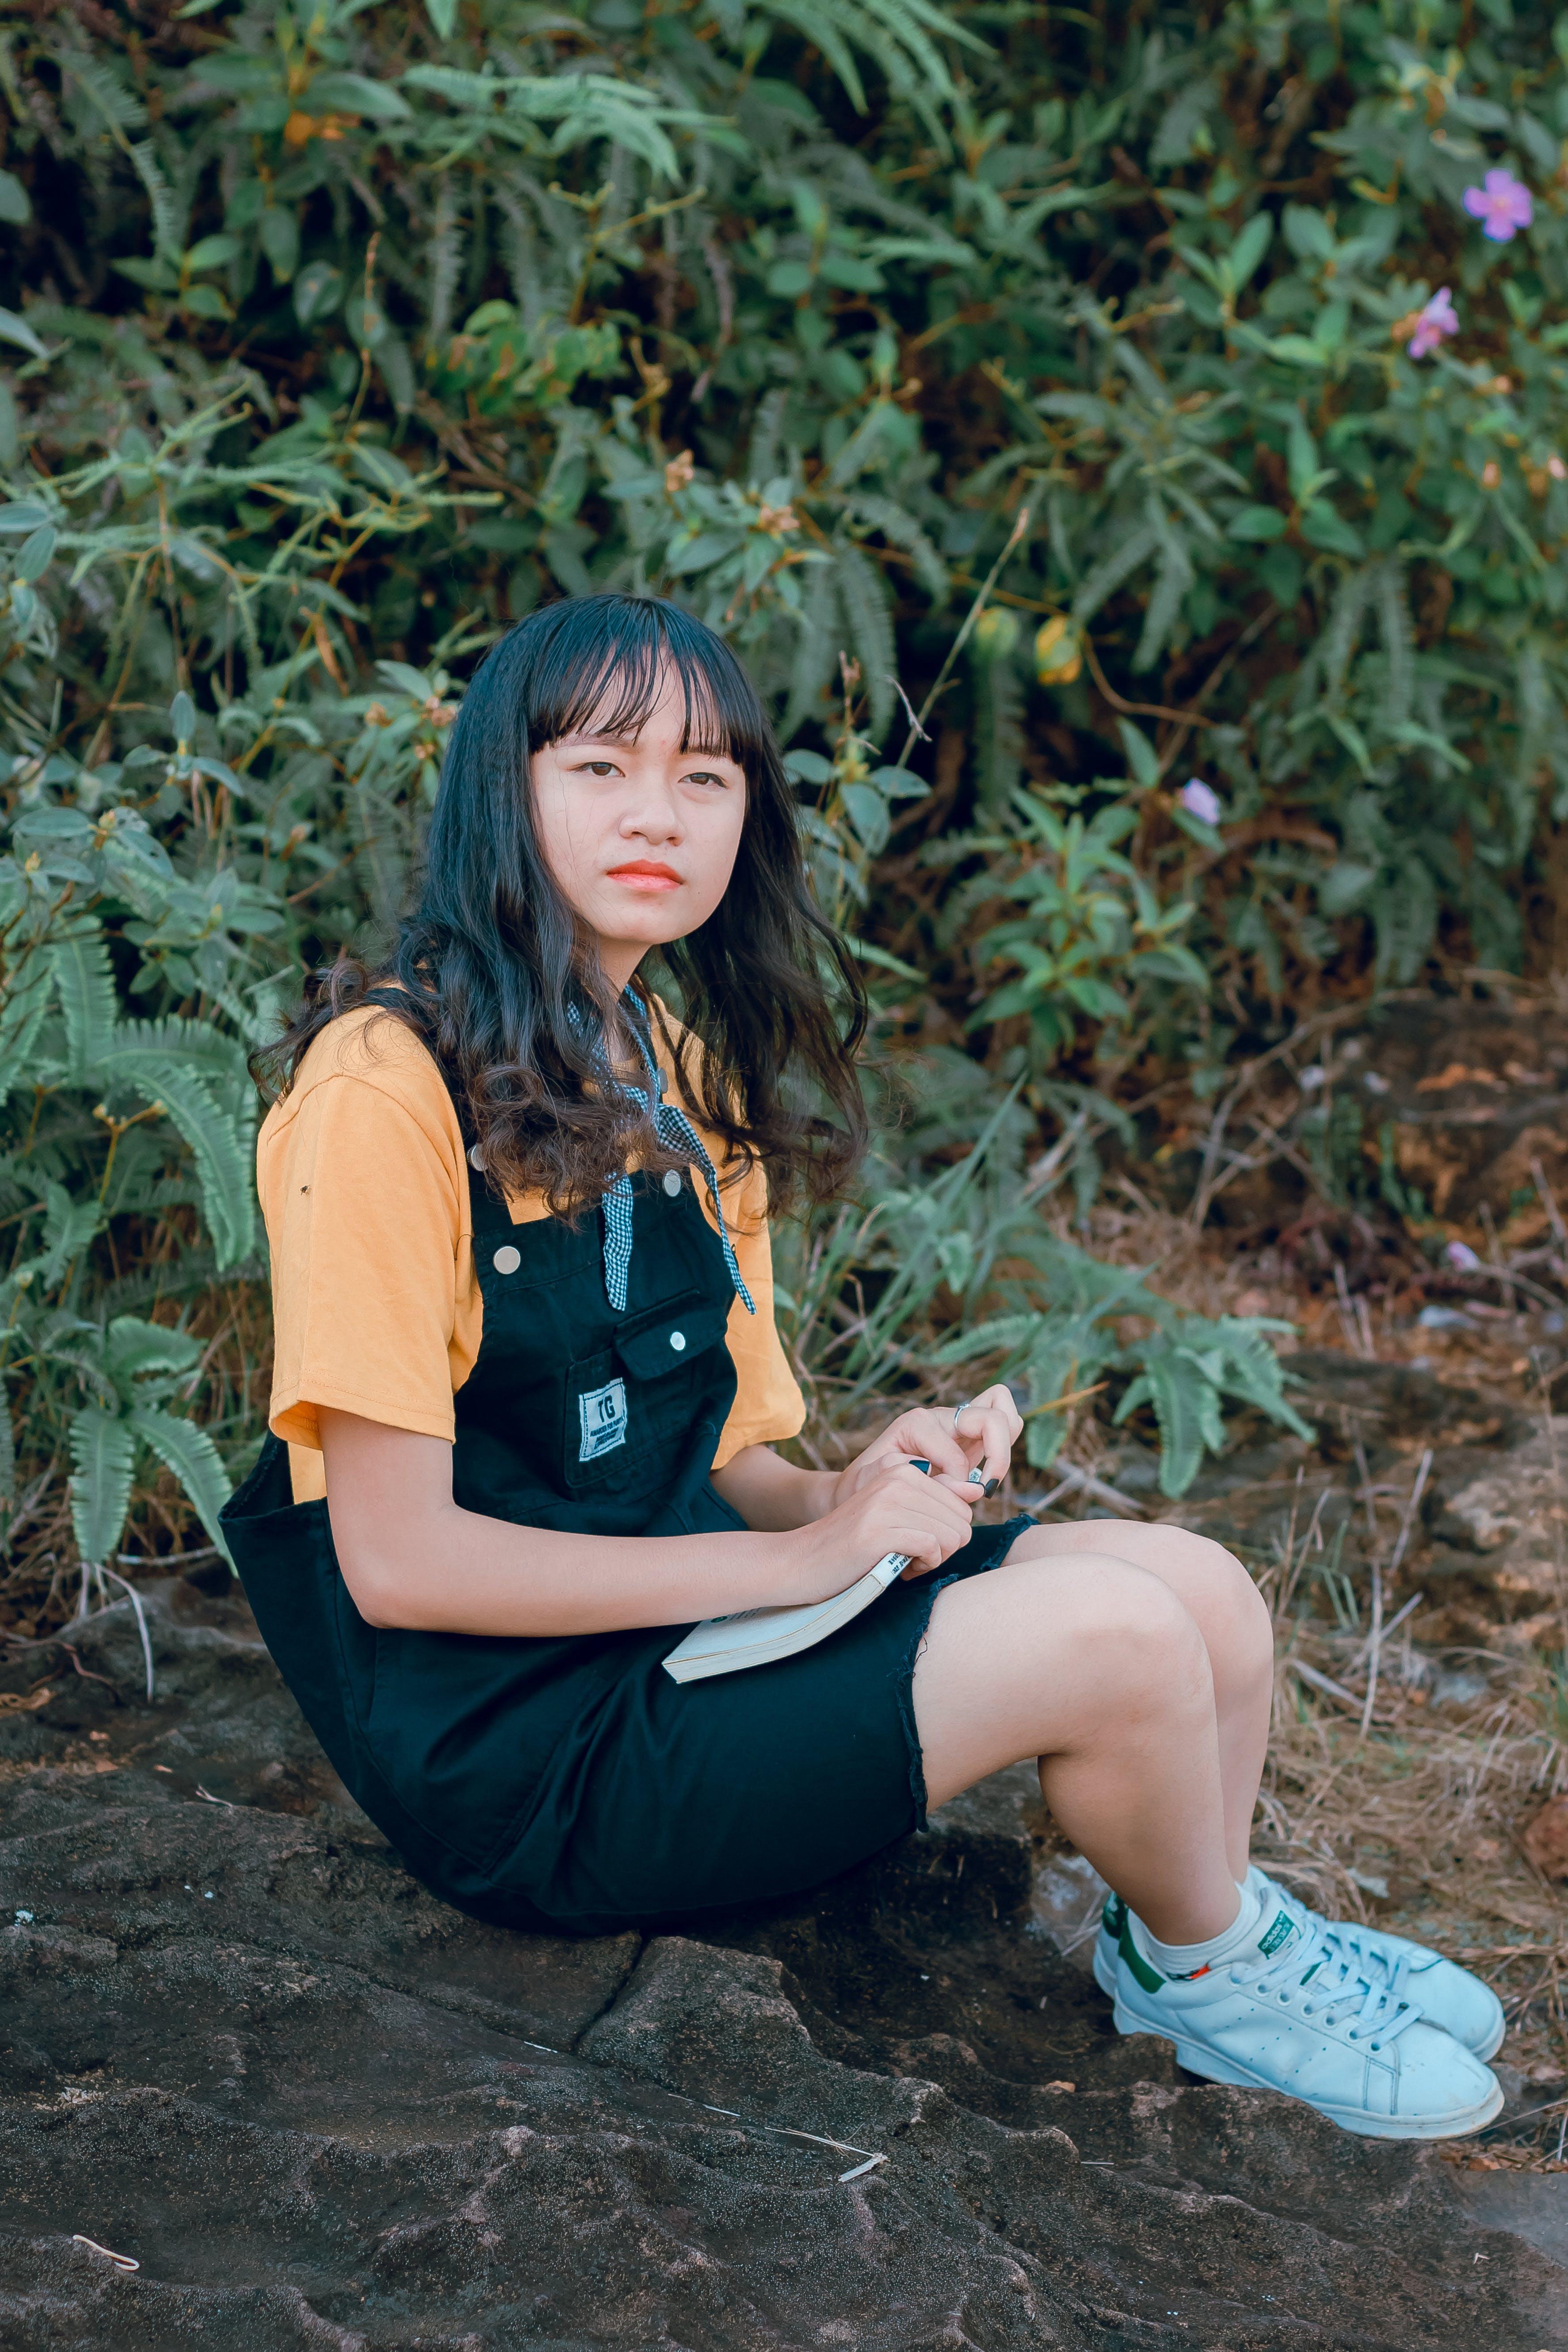 Girl in Black and Orange Shirt